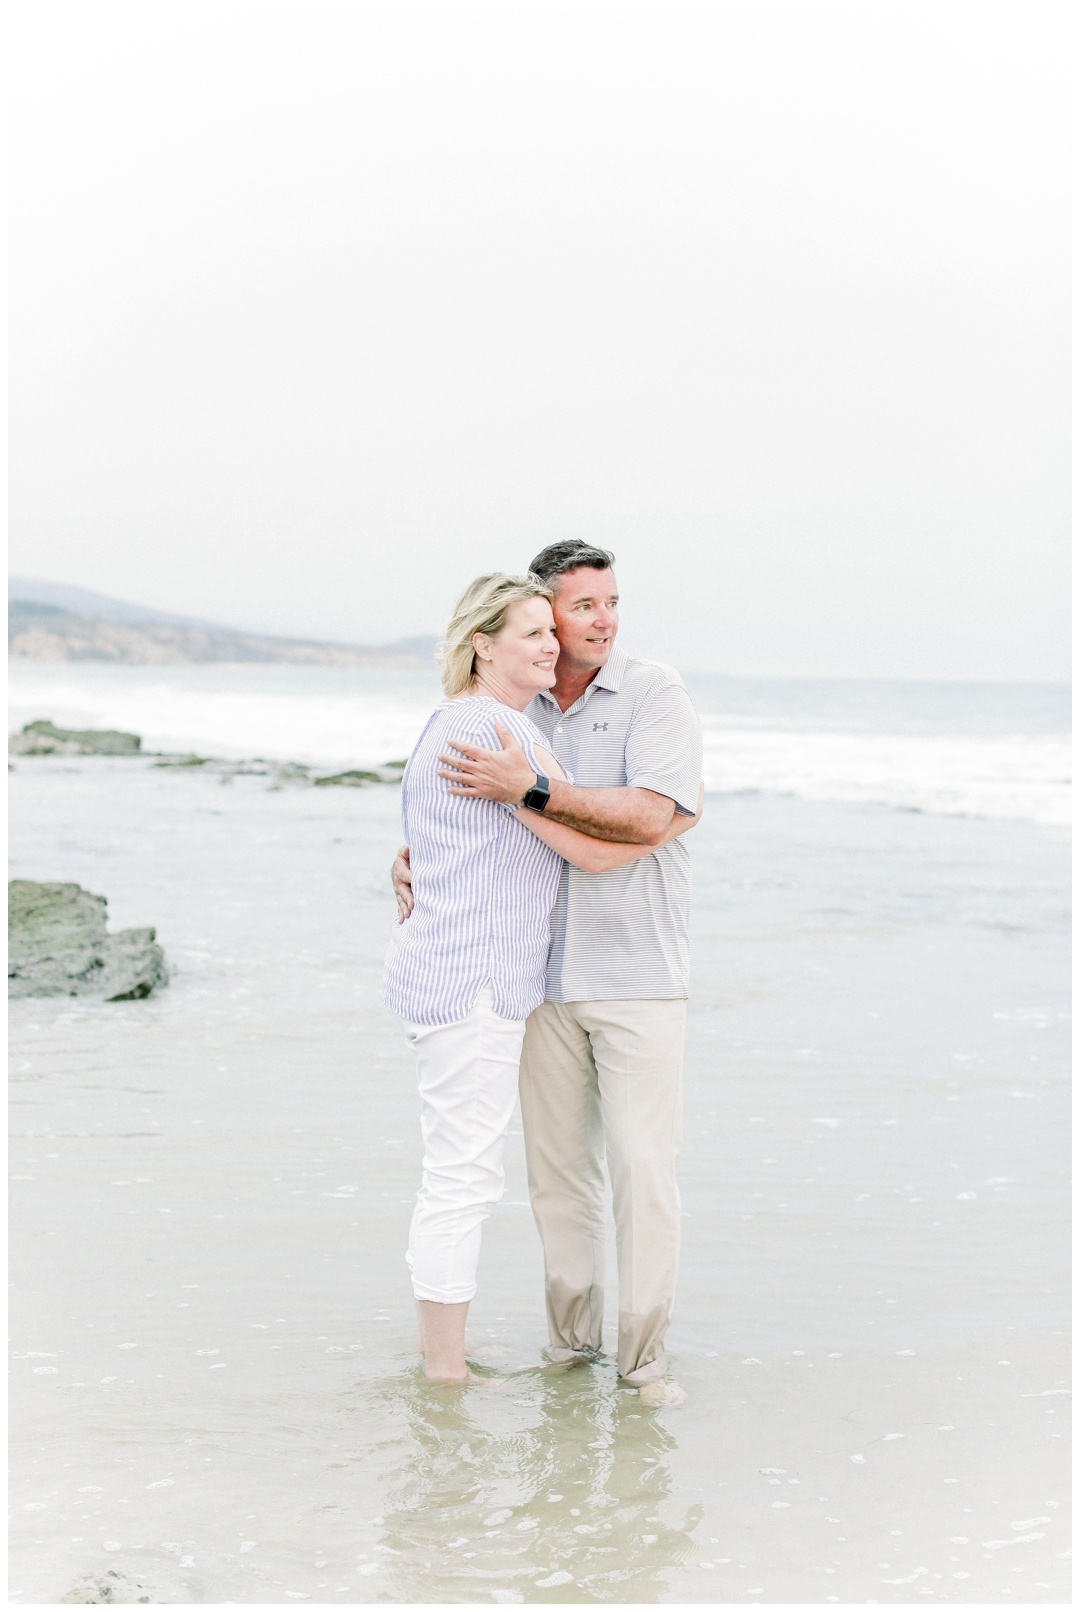 Newport_Beach_Family_Photographer_Orange_County_Family_Photography_Cori_Kleckner_Photography_Orange_County_Family_Photographer_Beach_Family_Session__1220.jpg